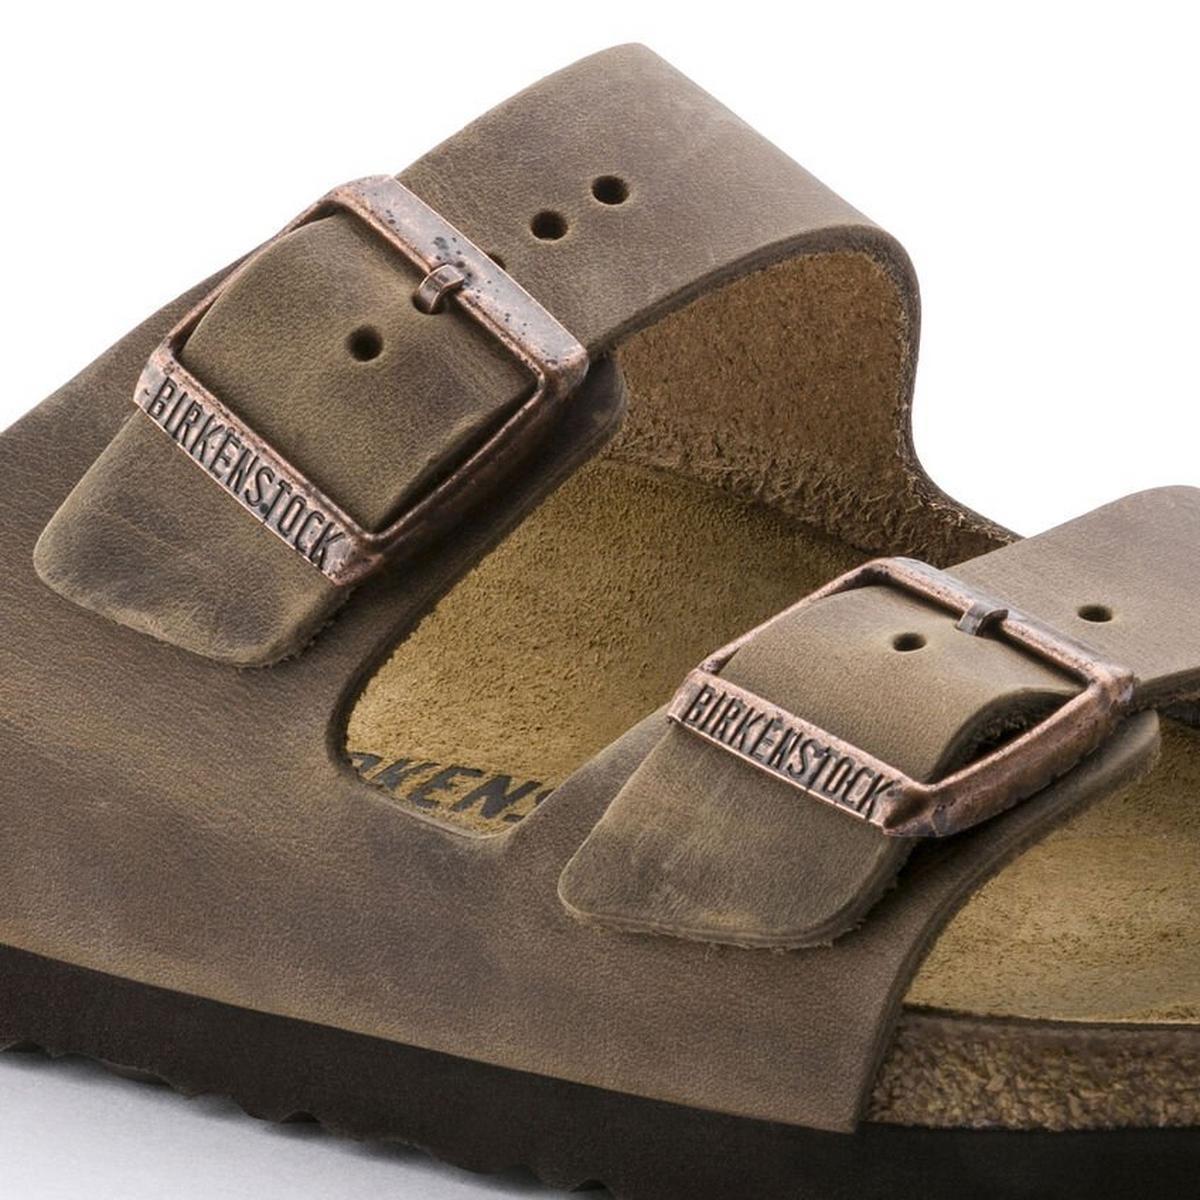 Birkenstock Sandals Arizona Slim Fit Oiled Leather Tobacco Brown